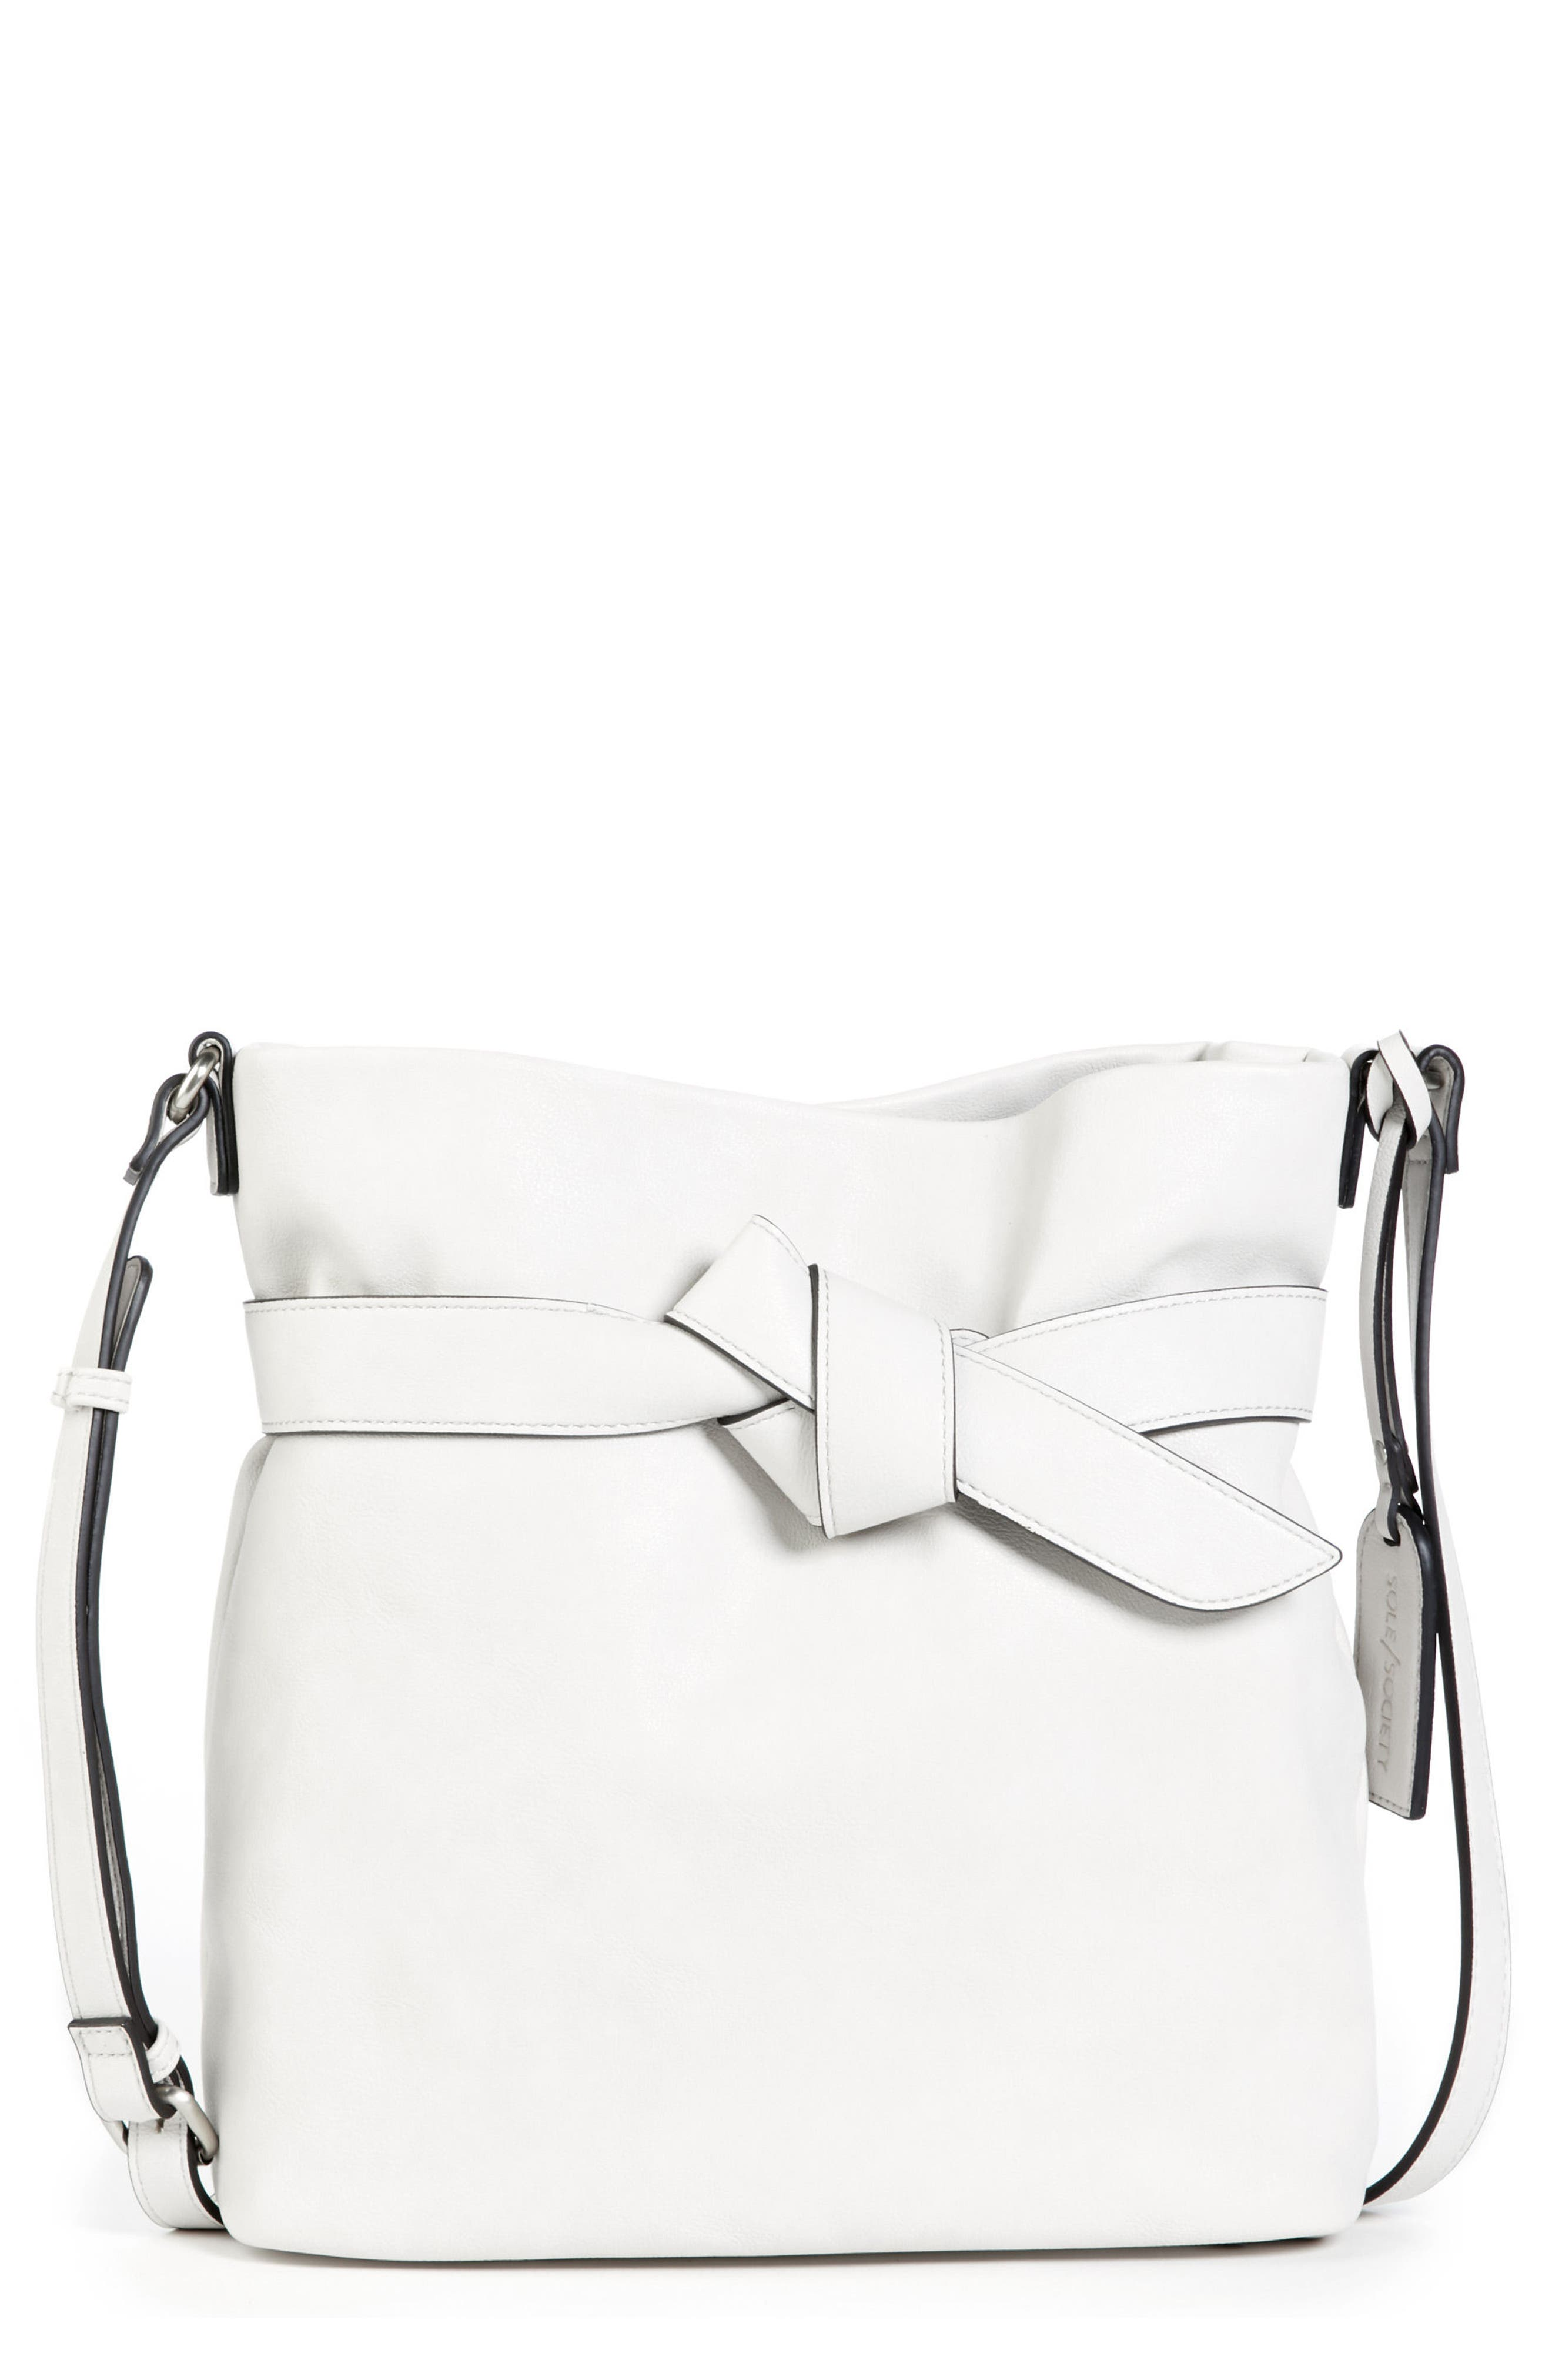 Karon Faux Leather Shoulder Bag,                         Main,                         color, 104